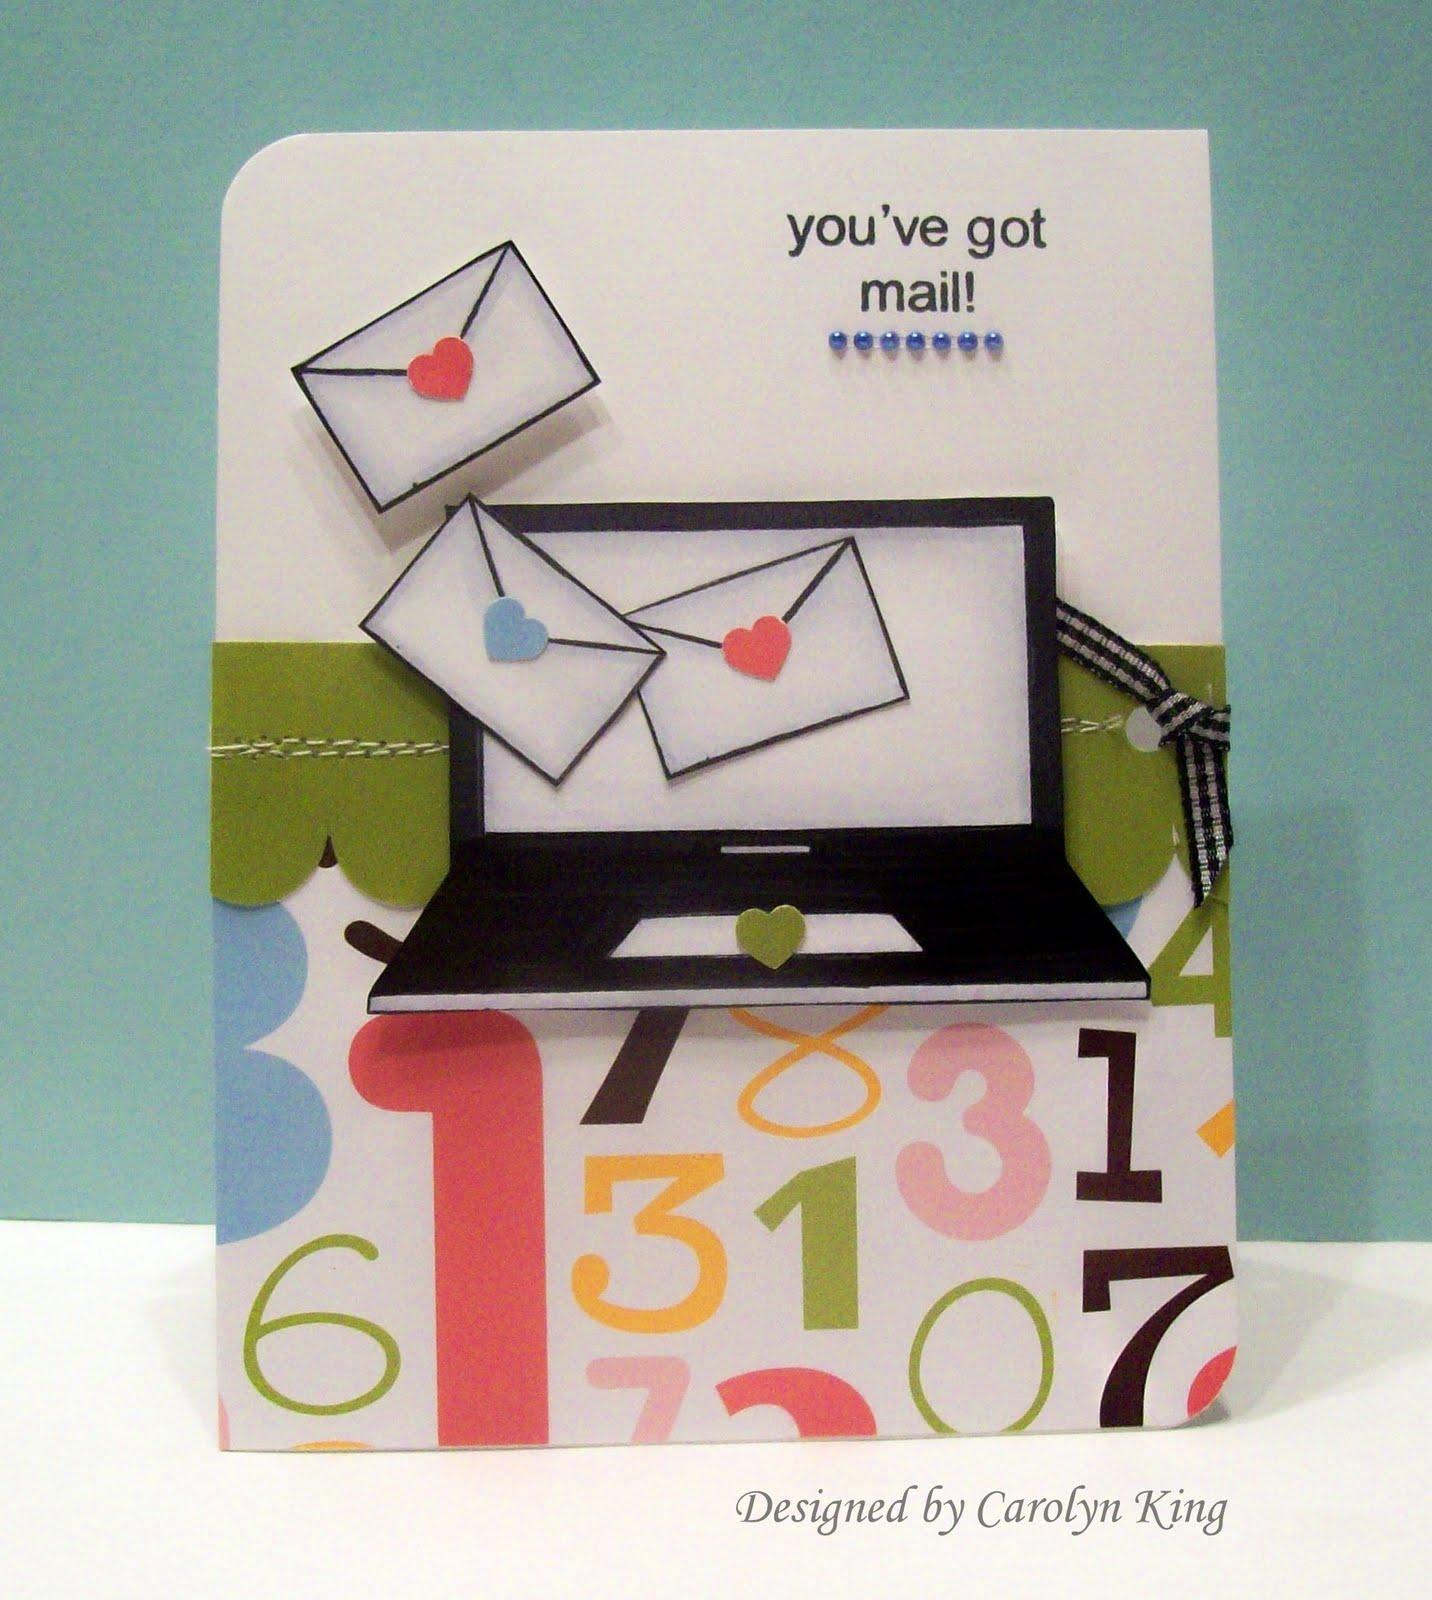 foxxy love блог на mail: